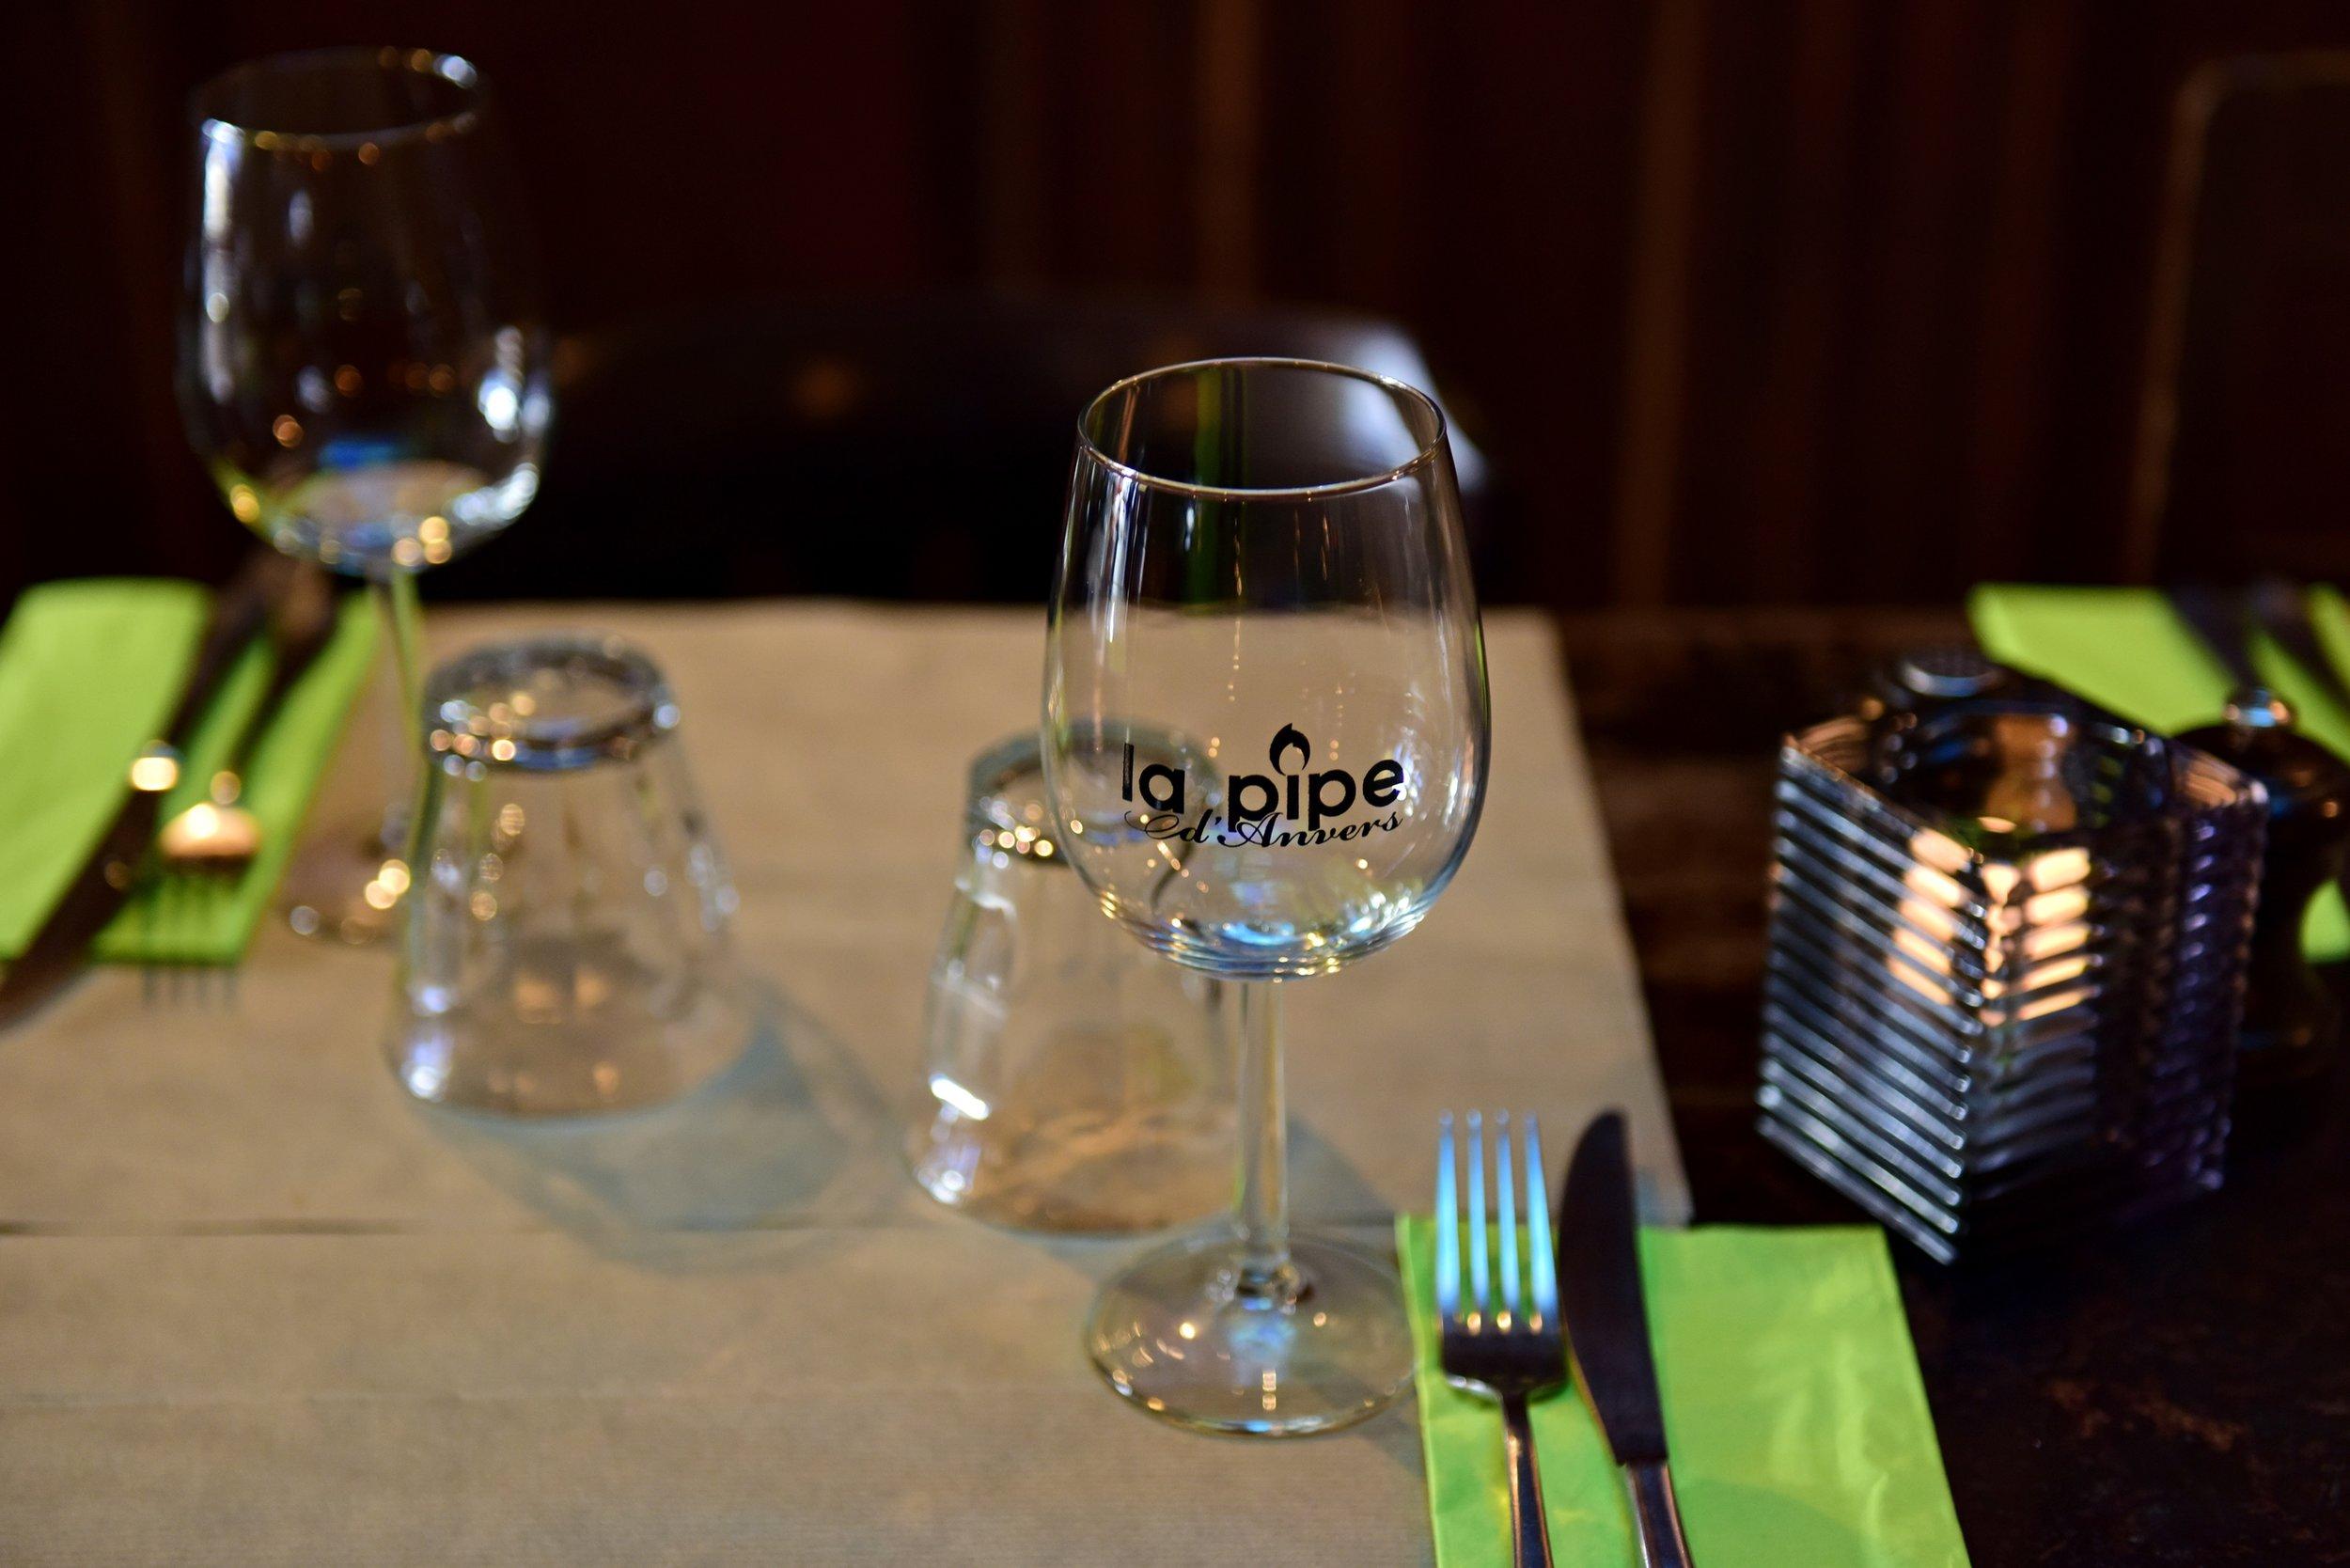 15 la pipe d anvers antwerpen brasserie antwerp best restaurant tablefever.jpg